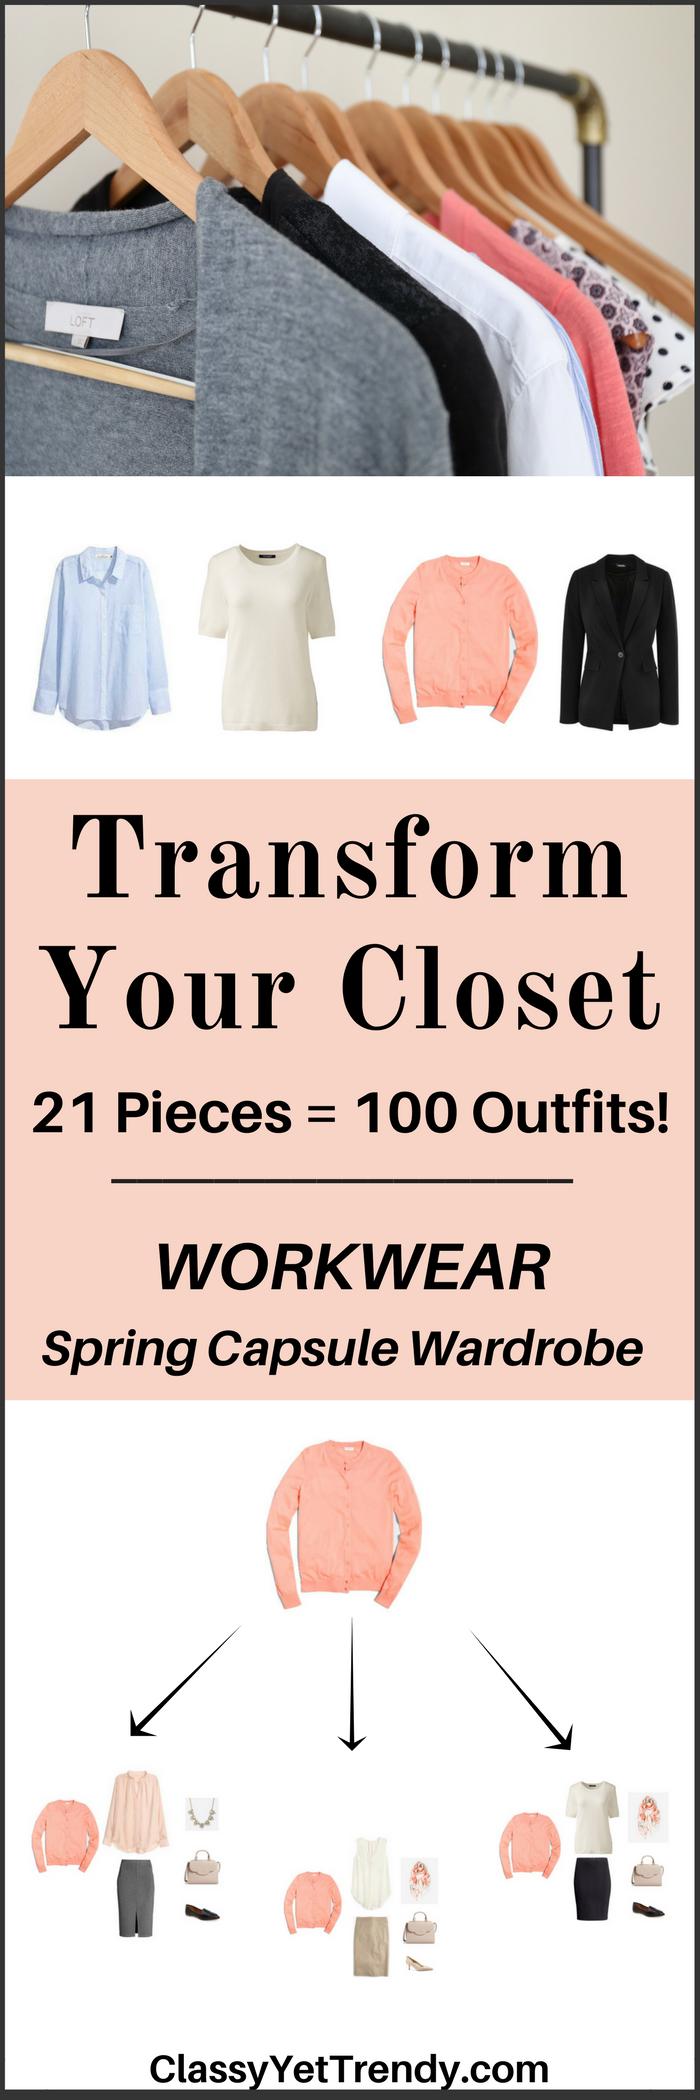 Workwear Capsule Wardrobe e-book- Spring 2017